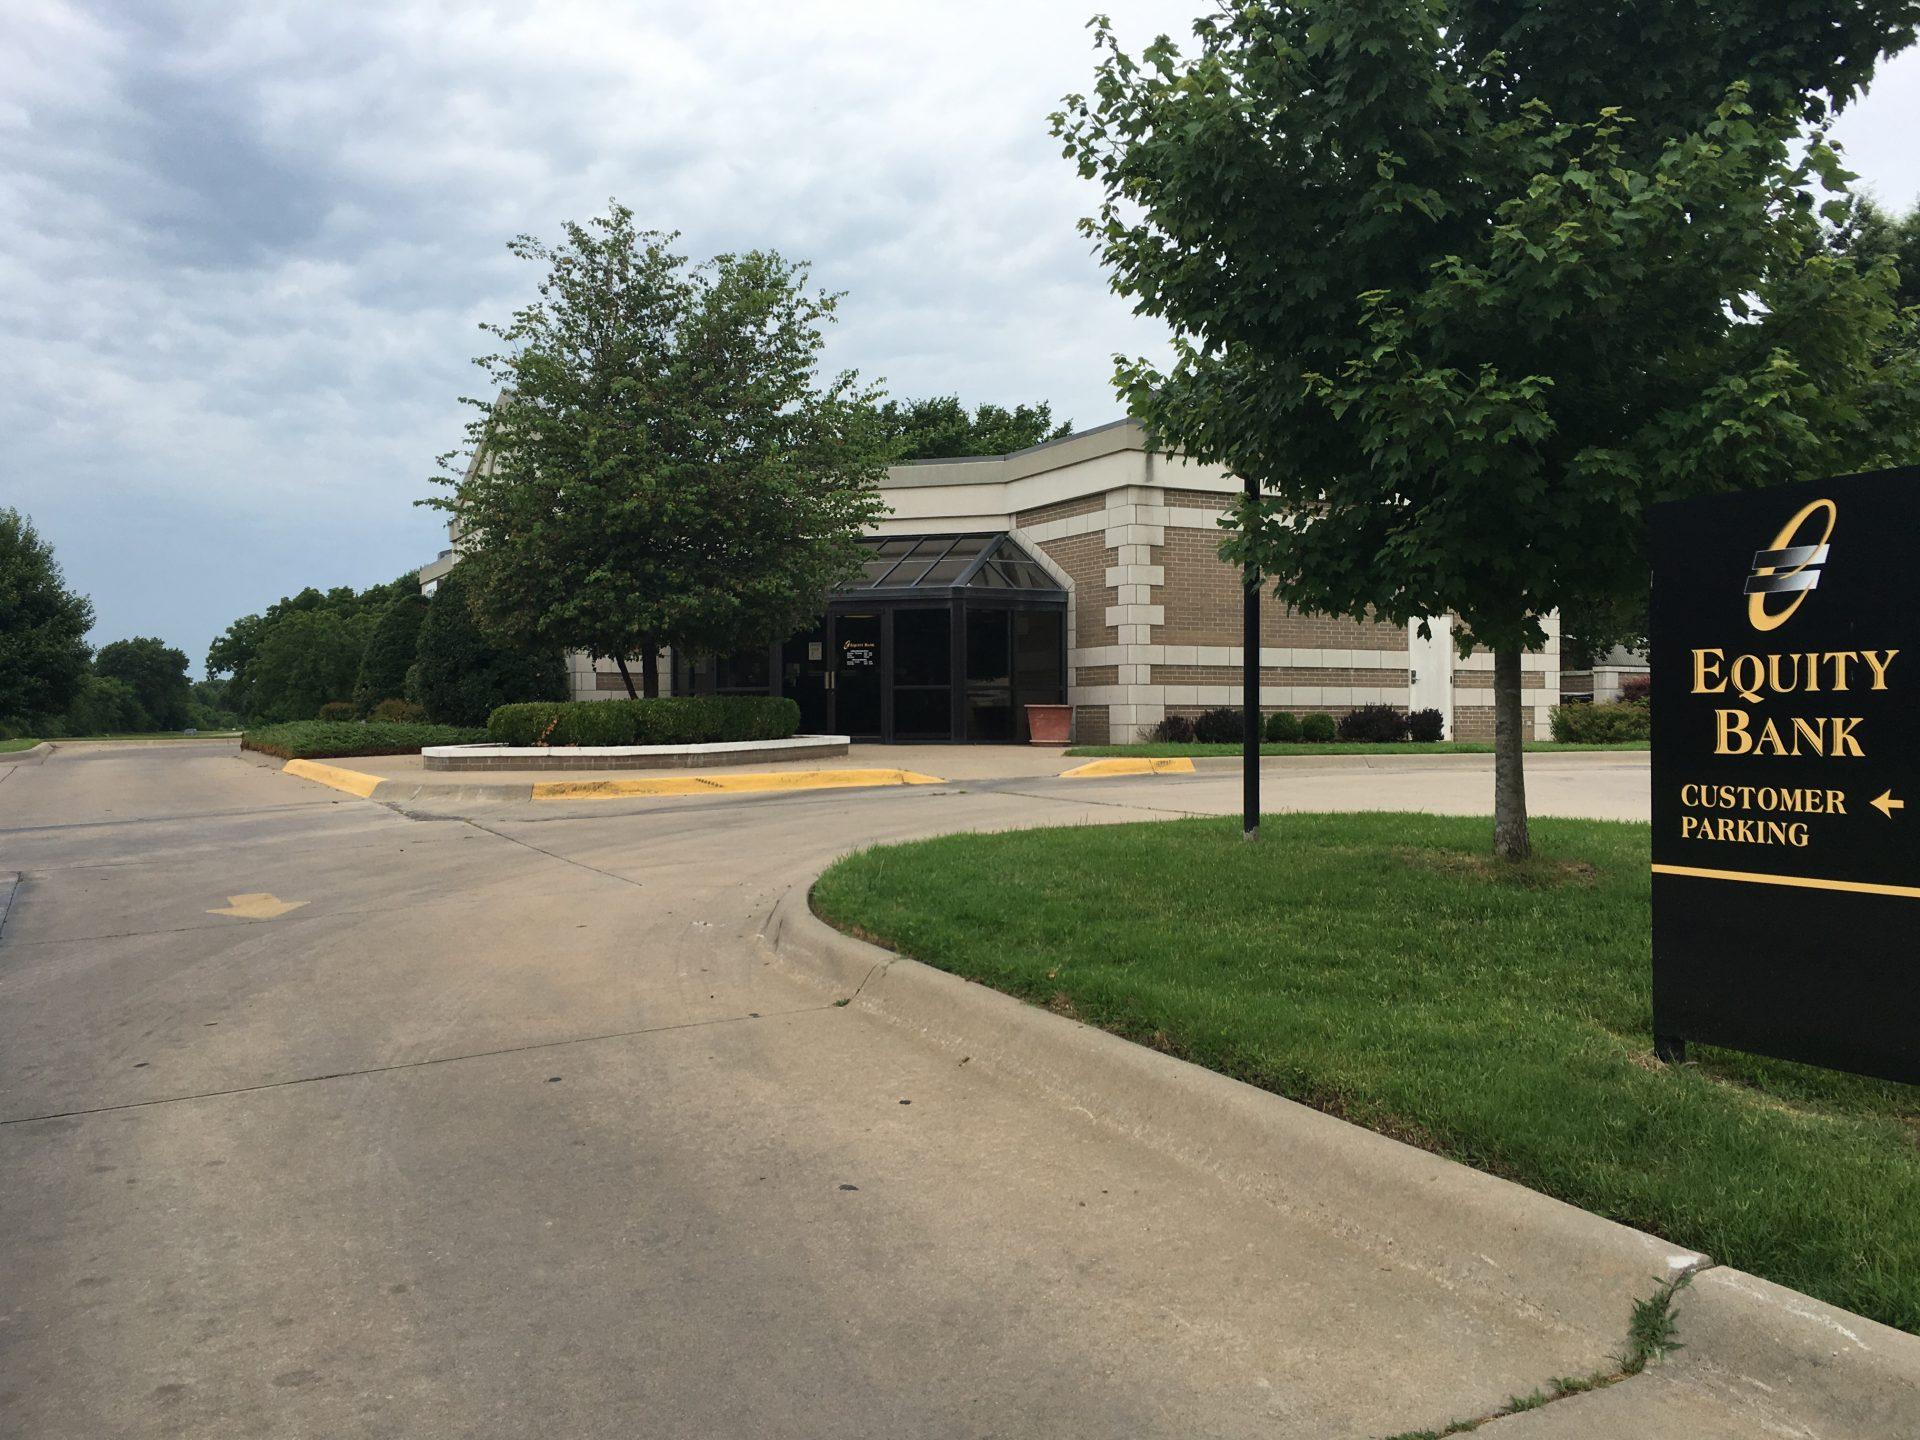 Equity Bank Coffeyville branch exterior.